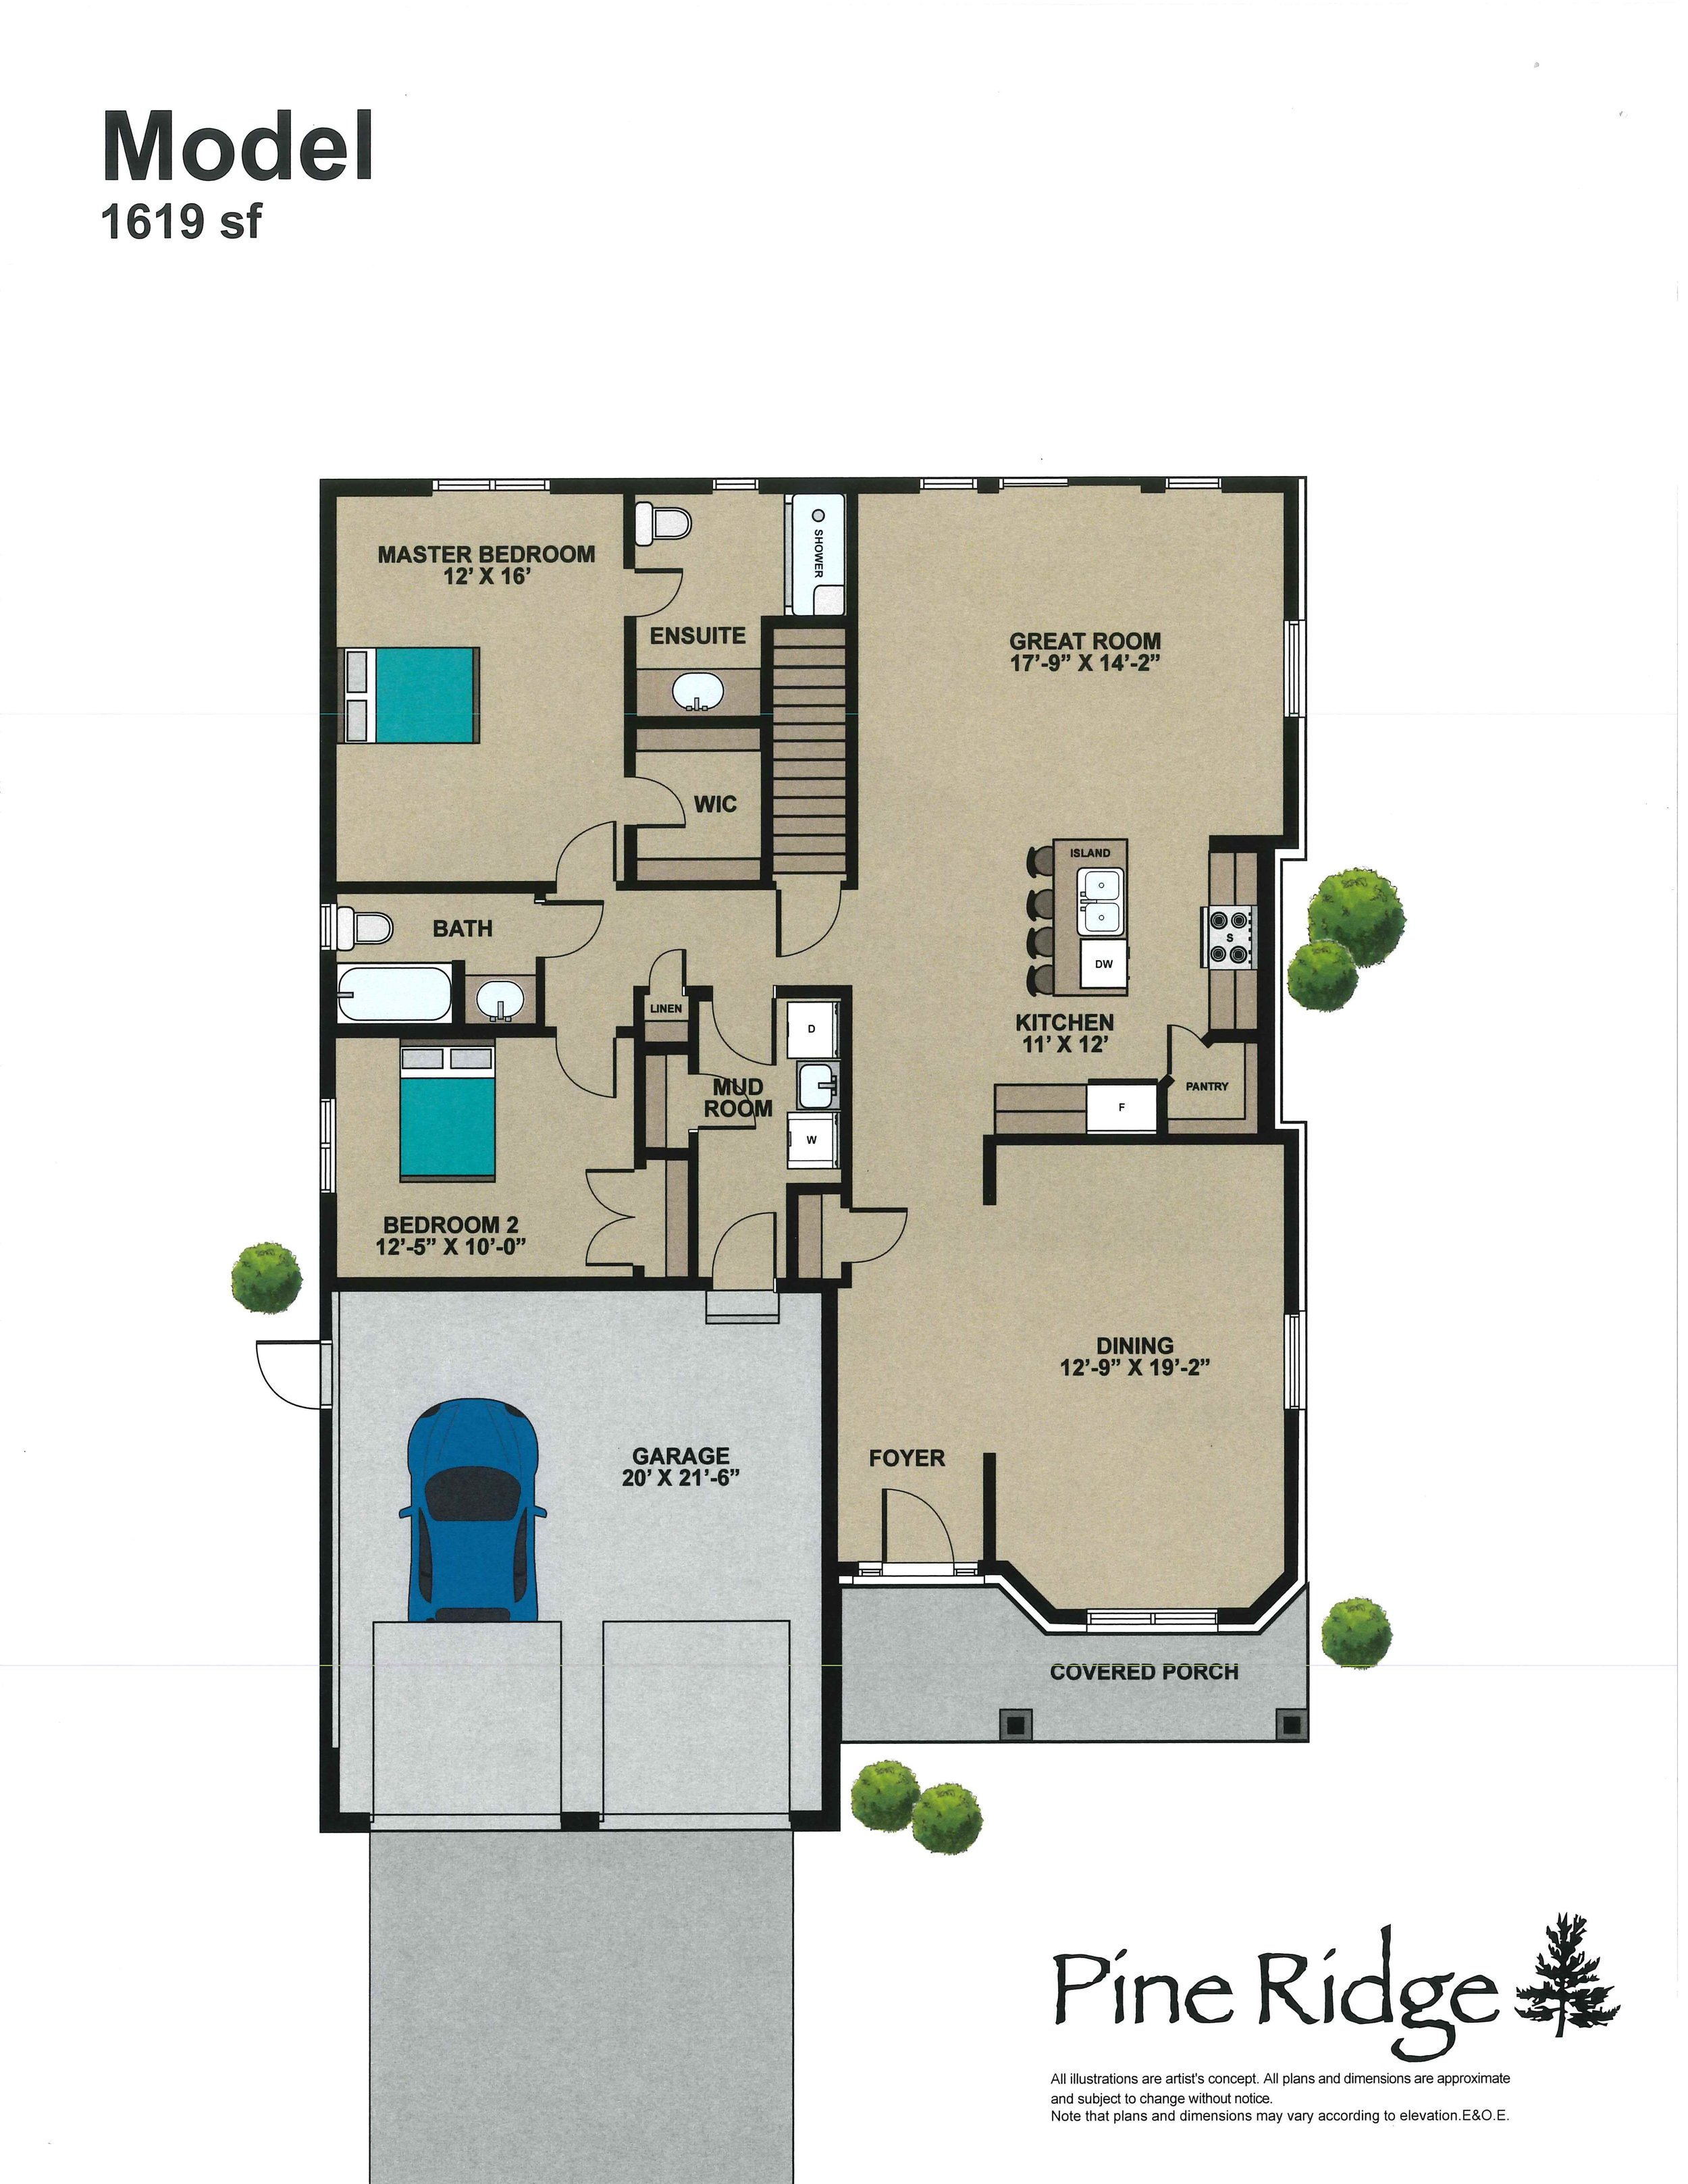 pineridge floorplans 1_Page_2.jpg